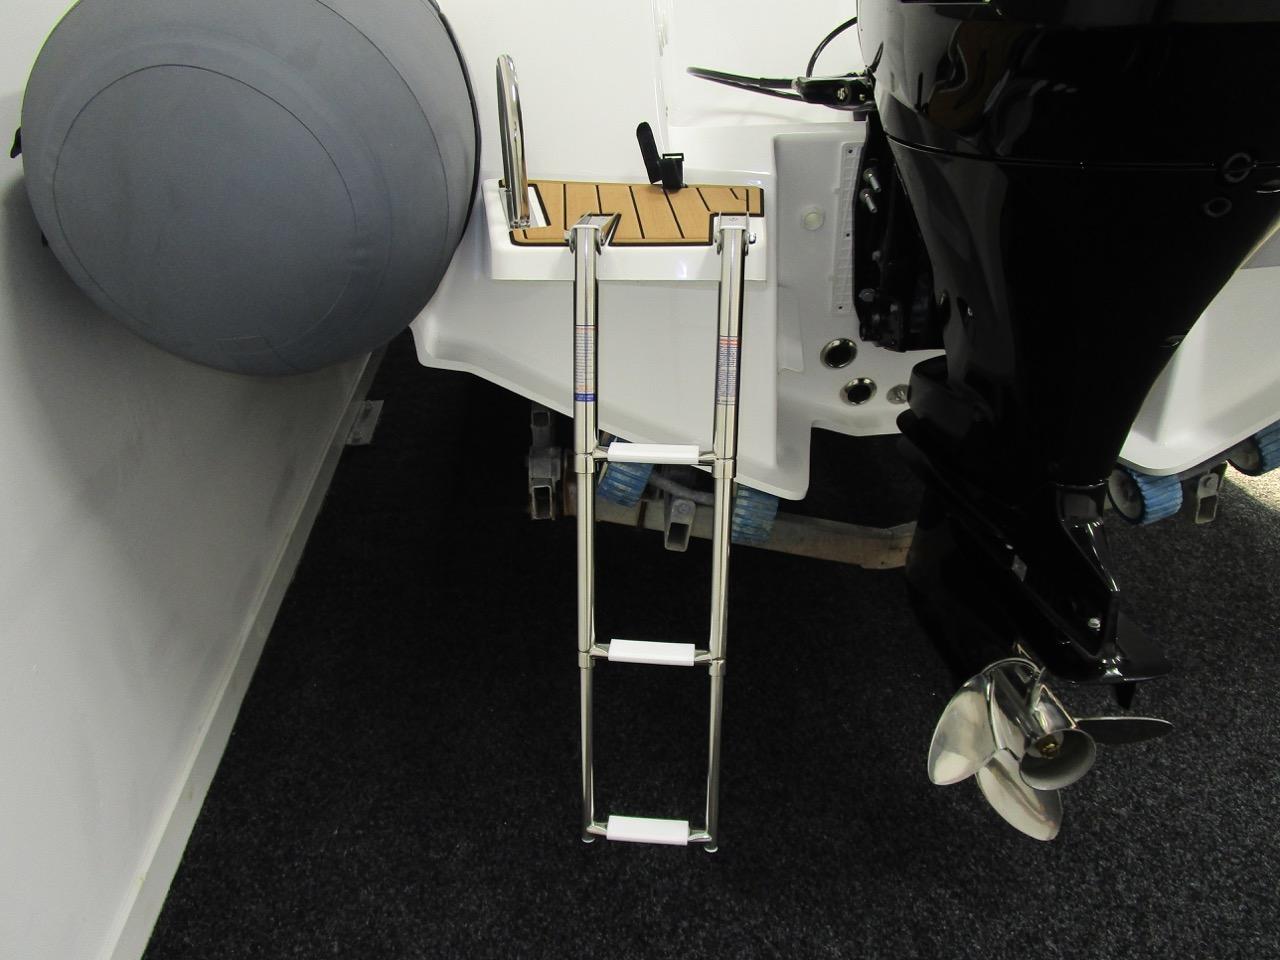 E780 boarding ladder down